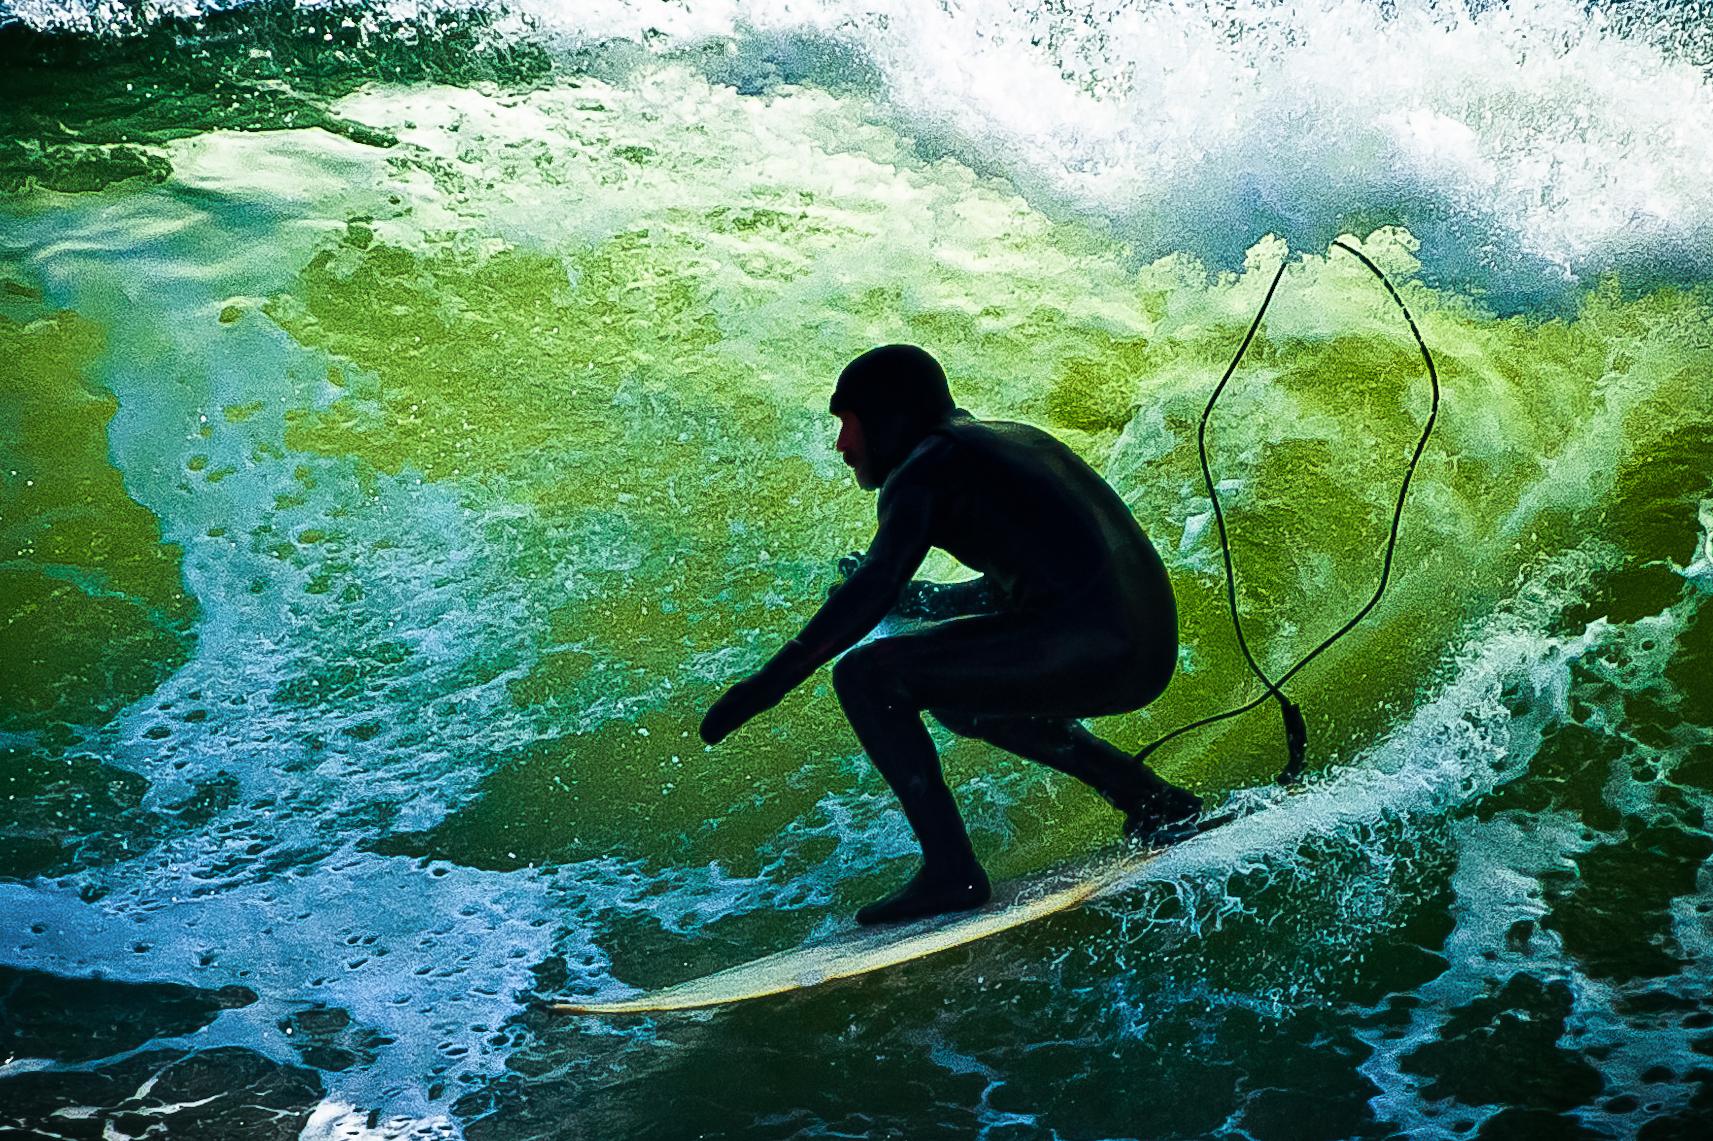 Paul Murray, Wave Ninja